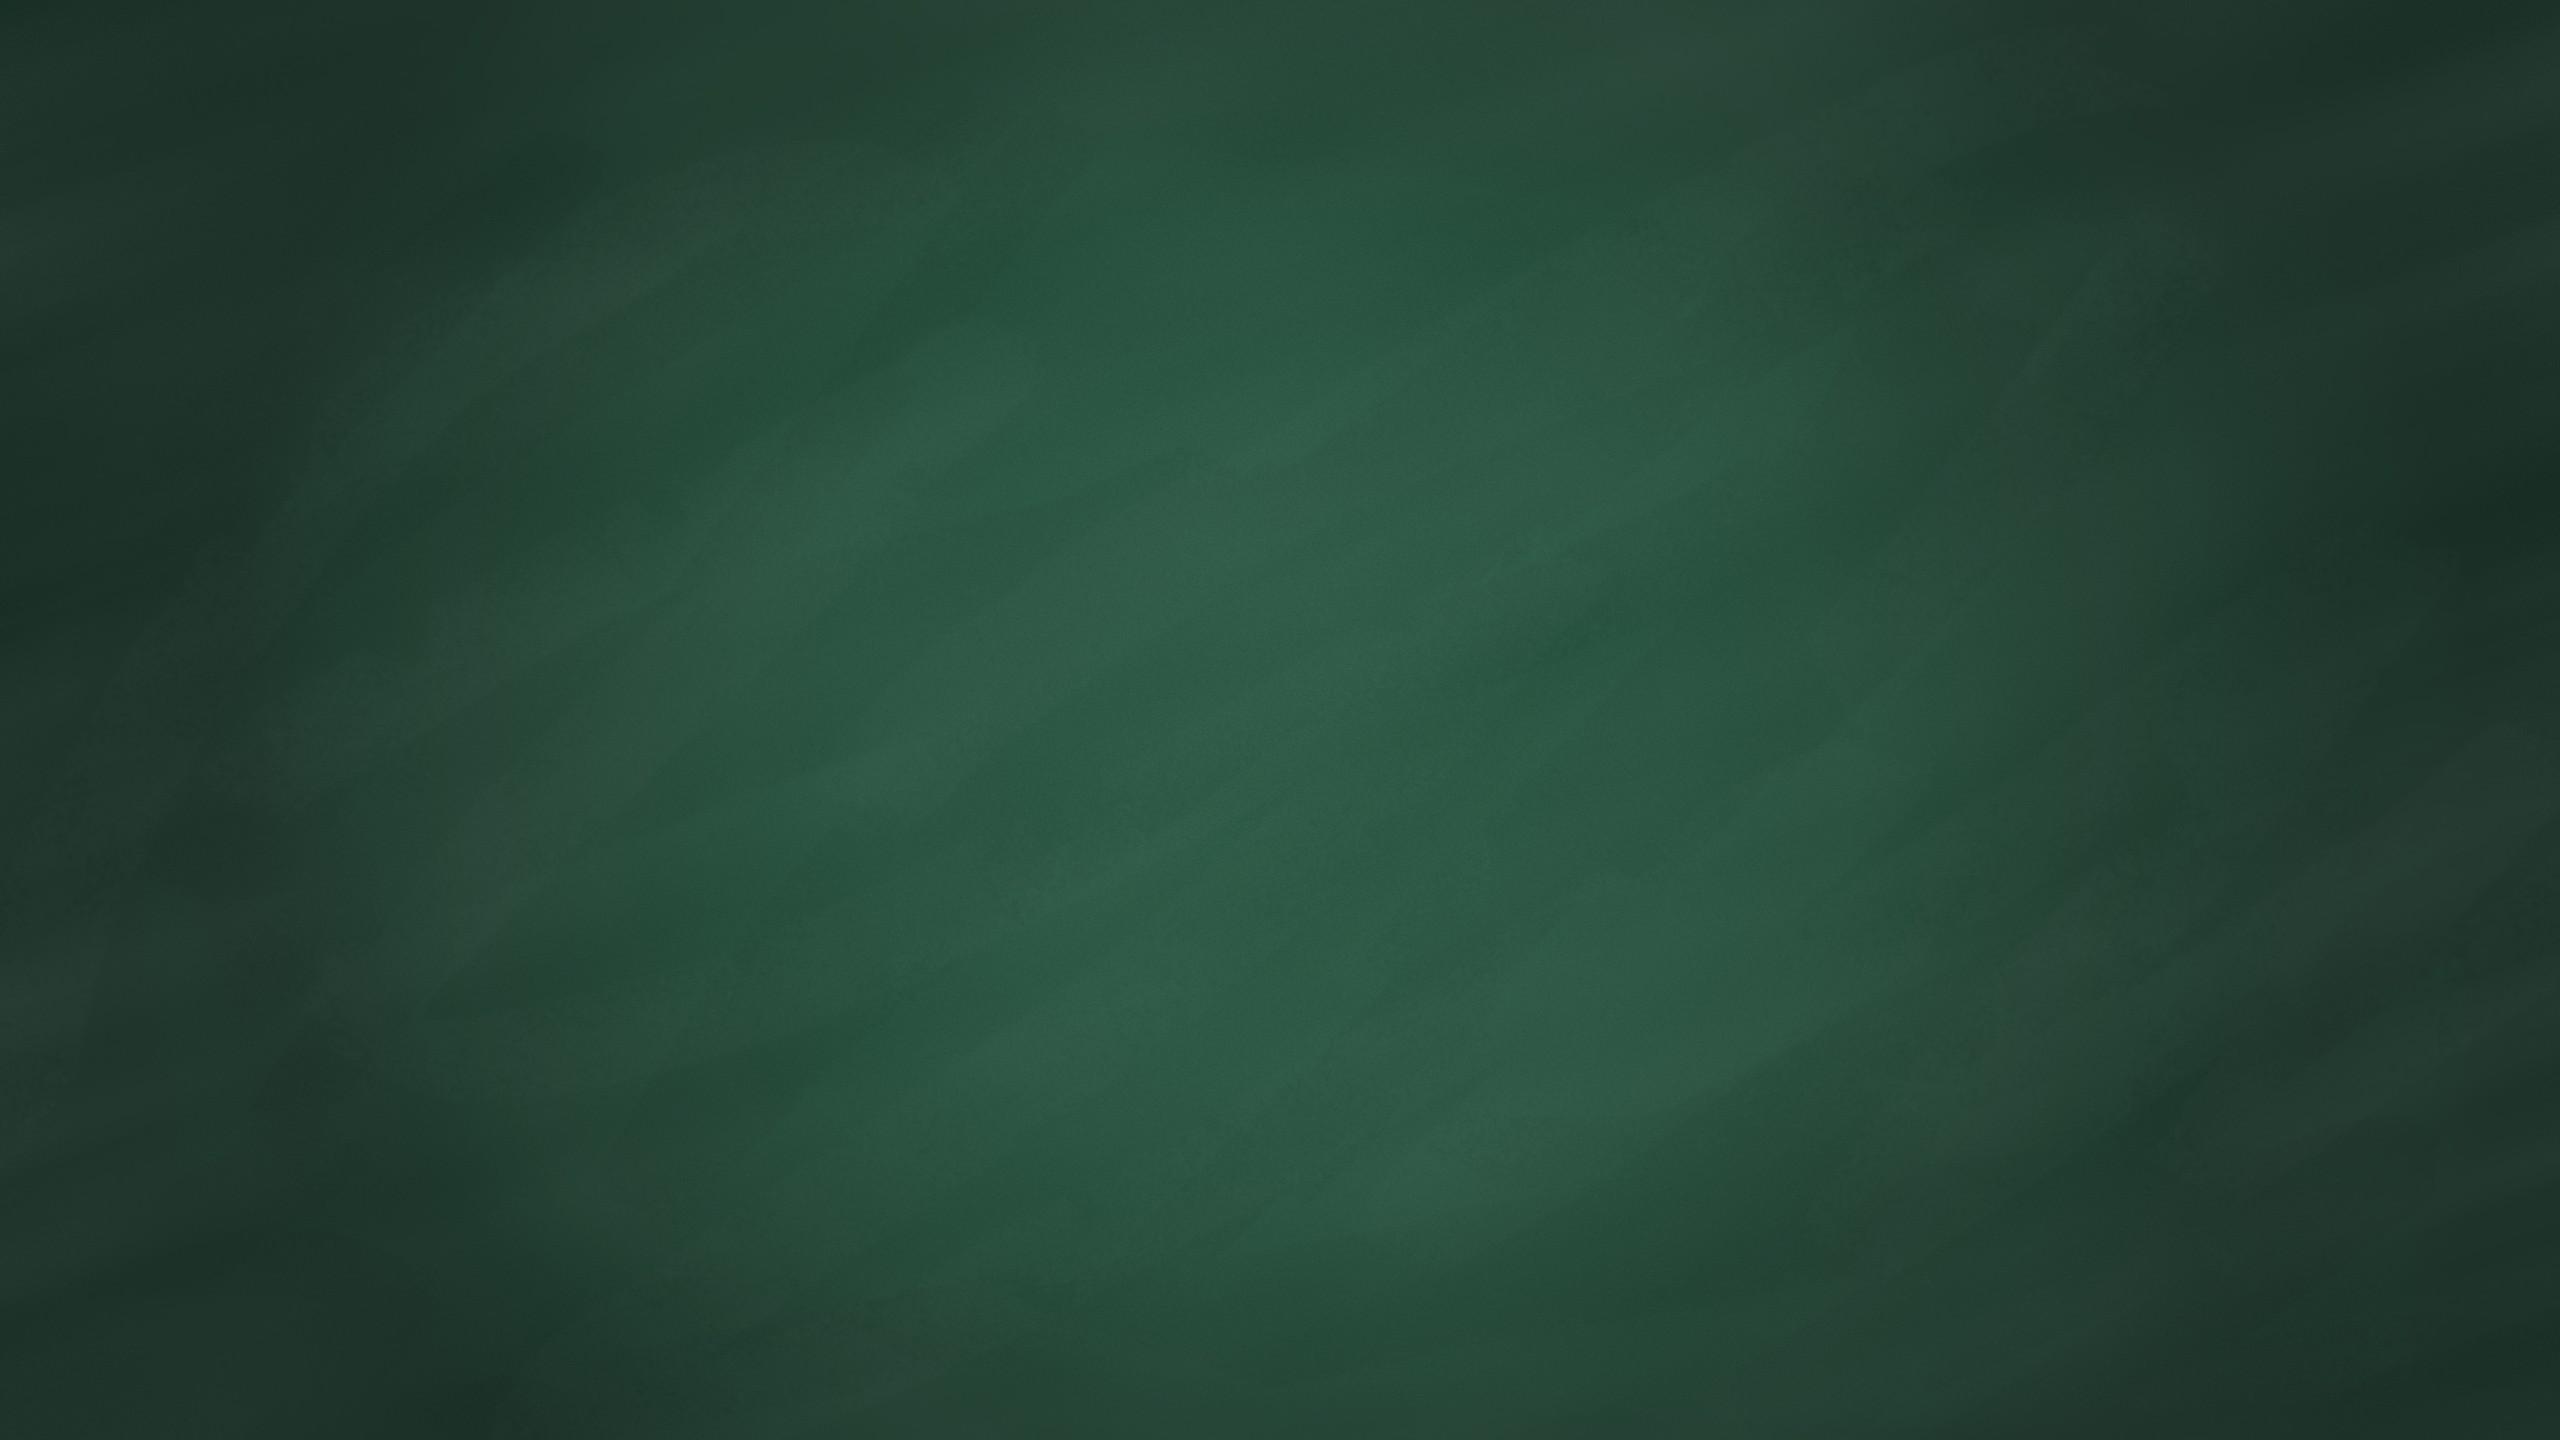 James Harden Wallpaper Hd Blackboard Background 183 ① Download Free Stunning High